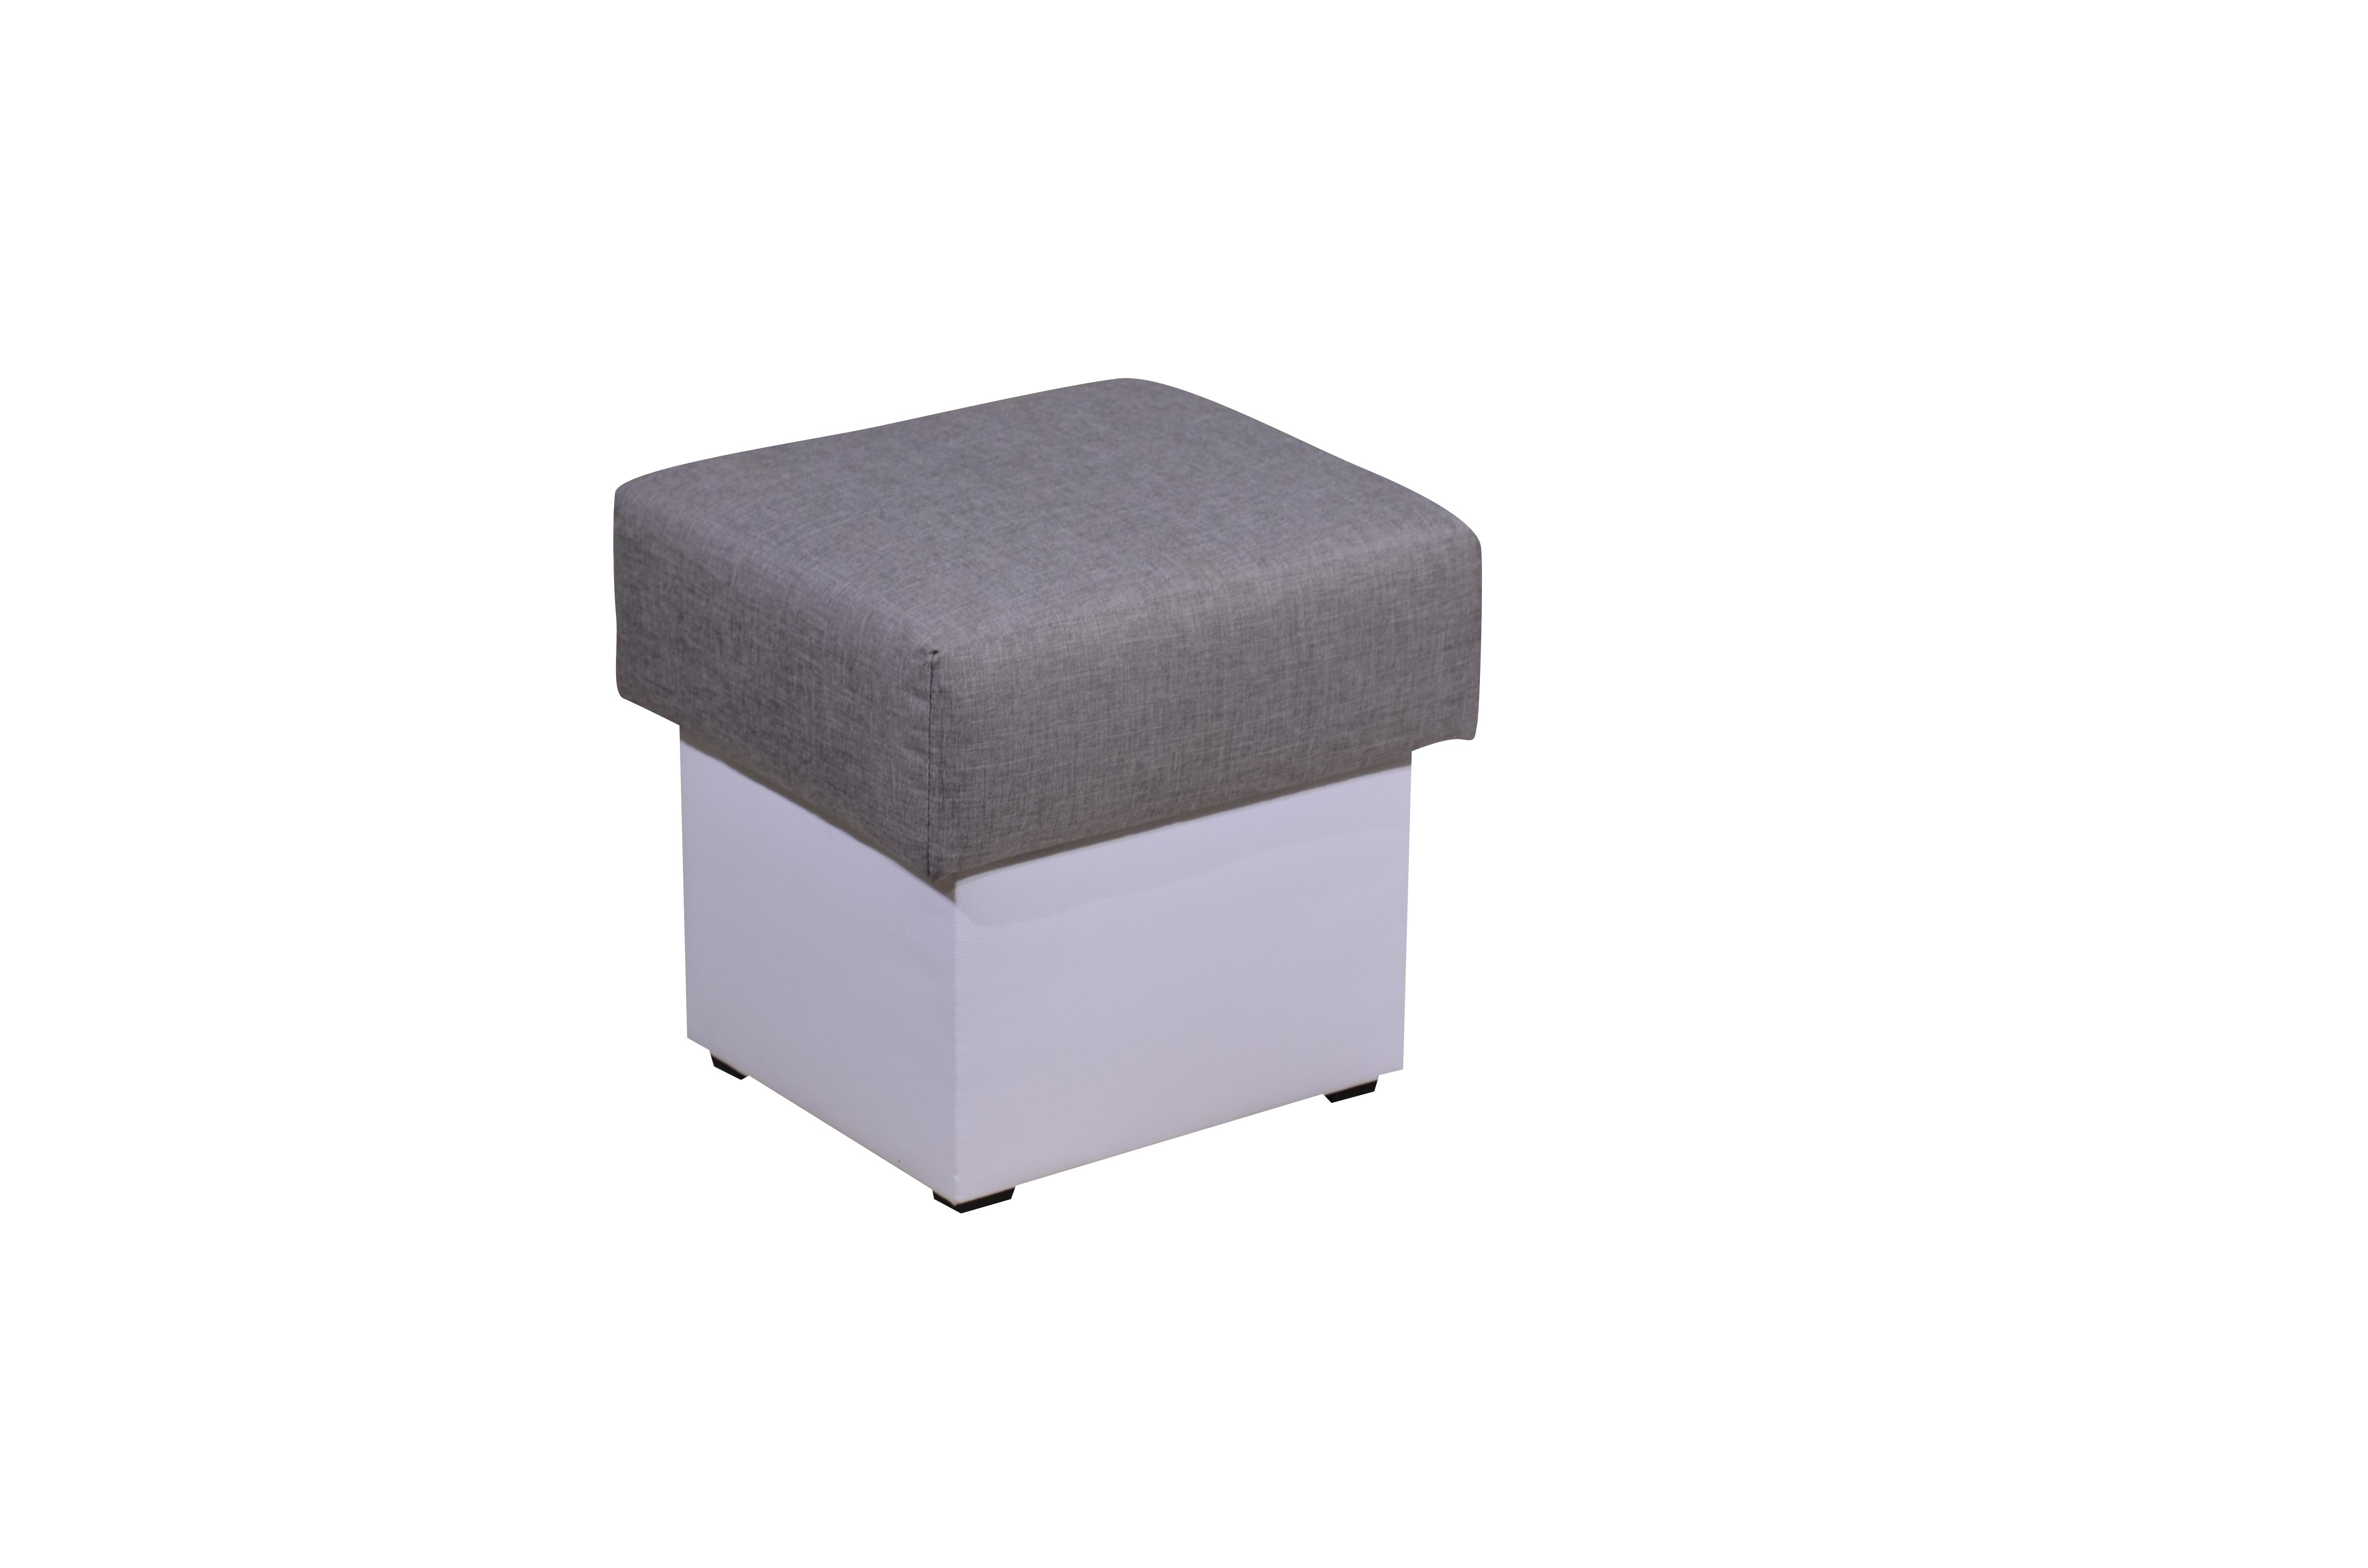 Smartshop Taburet TOMINO látka šedá/bílá ekokůže DOPRODEJ